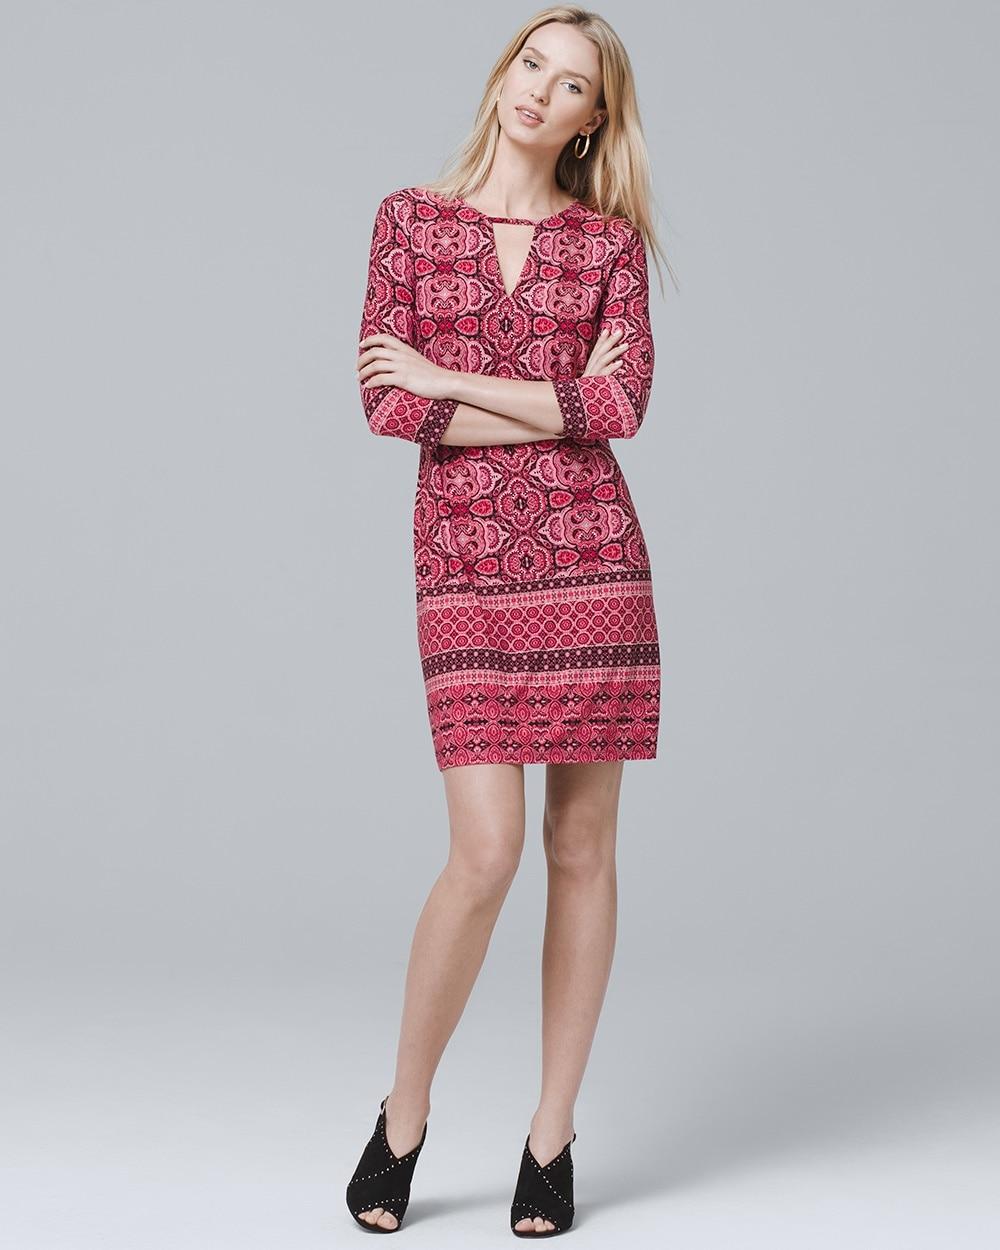 531a95db9a 3 4-Sleeve Mirror Print Knit Shift Dress - White House Black Market